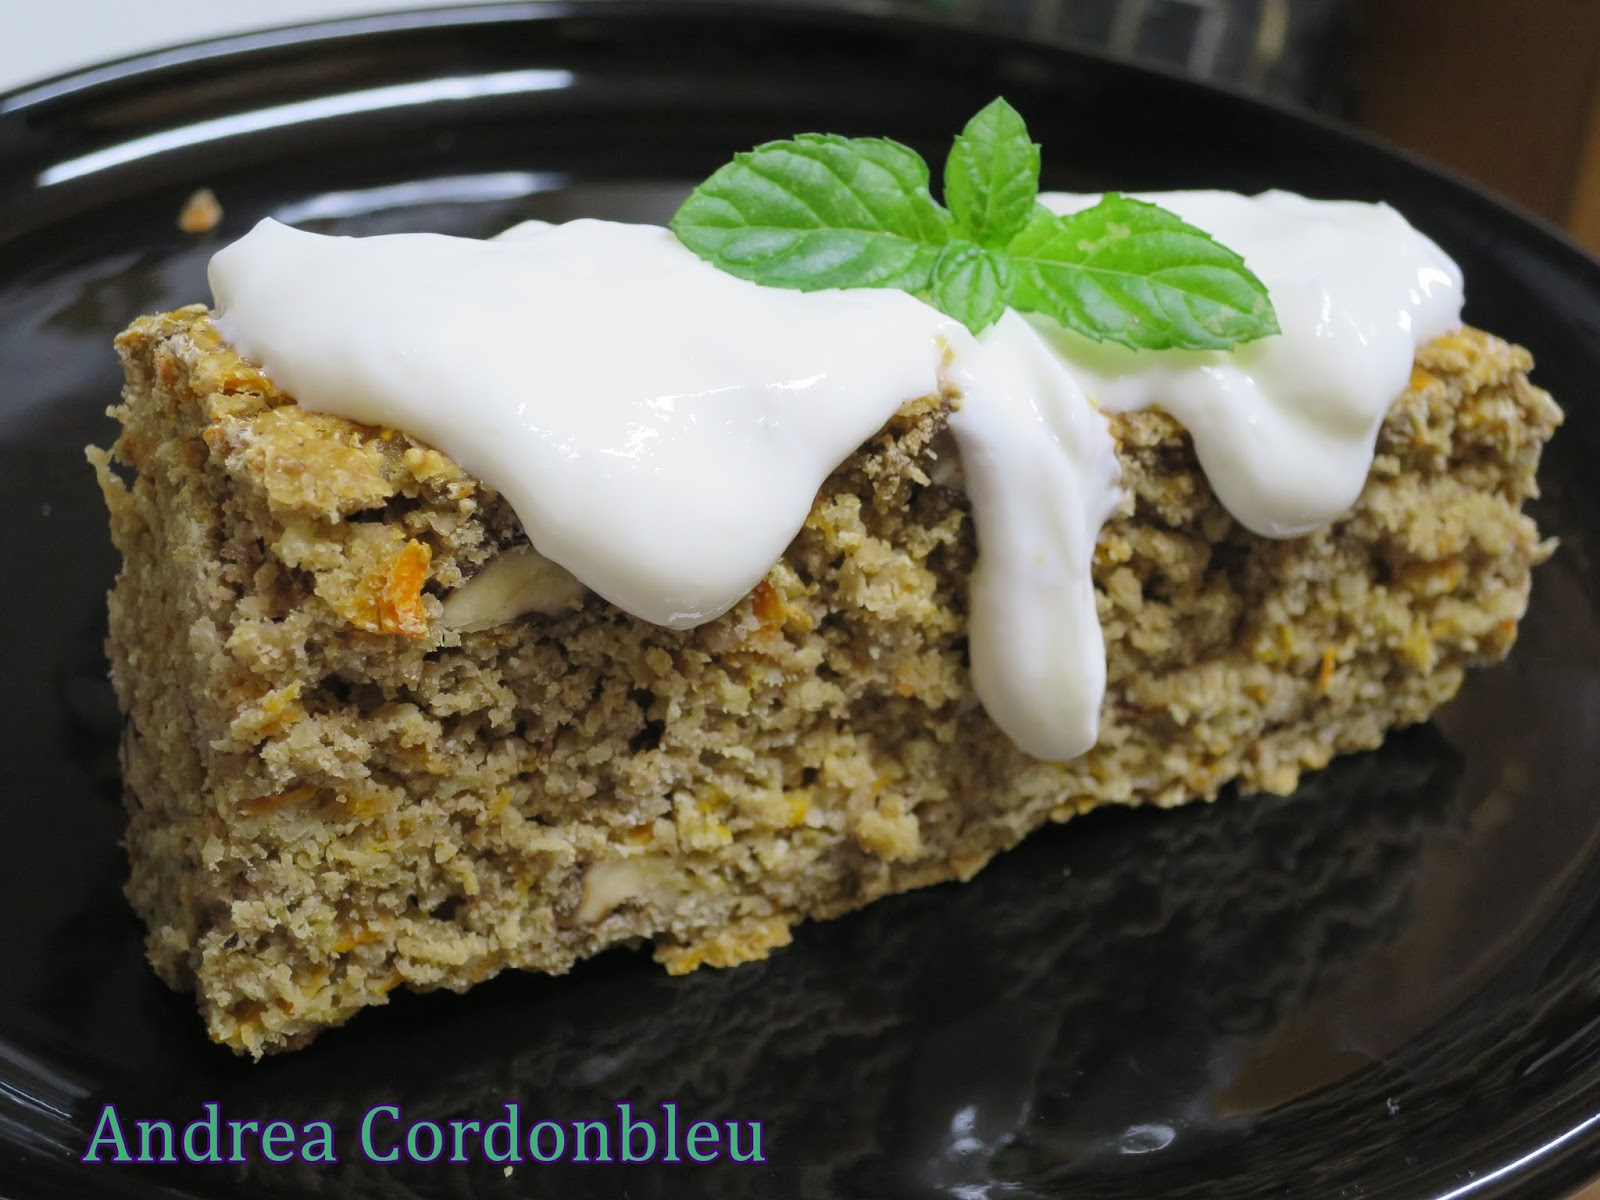 Cordonbleu tarta de zanahoria fitness la cocina fit de vikika - La cocina fit de vikika pdf ...